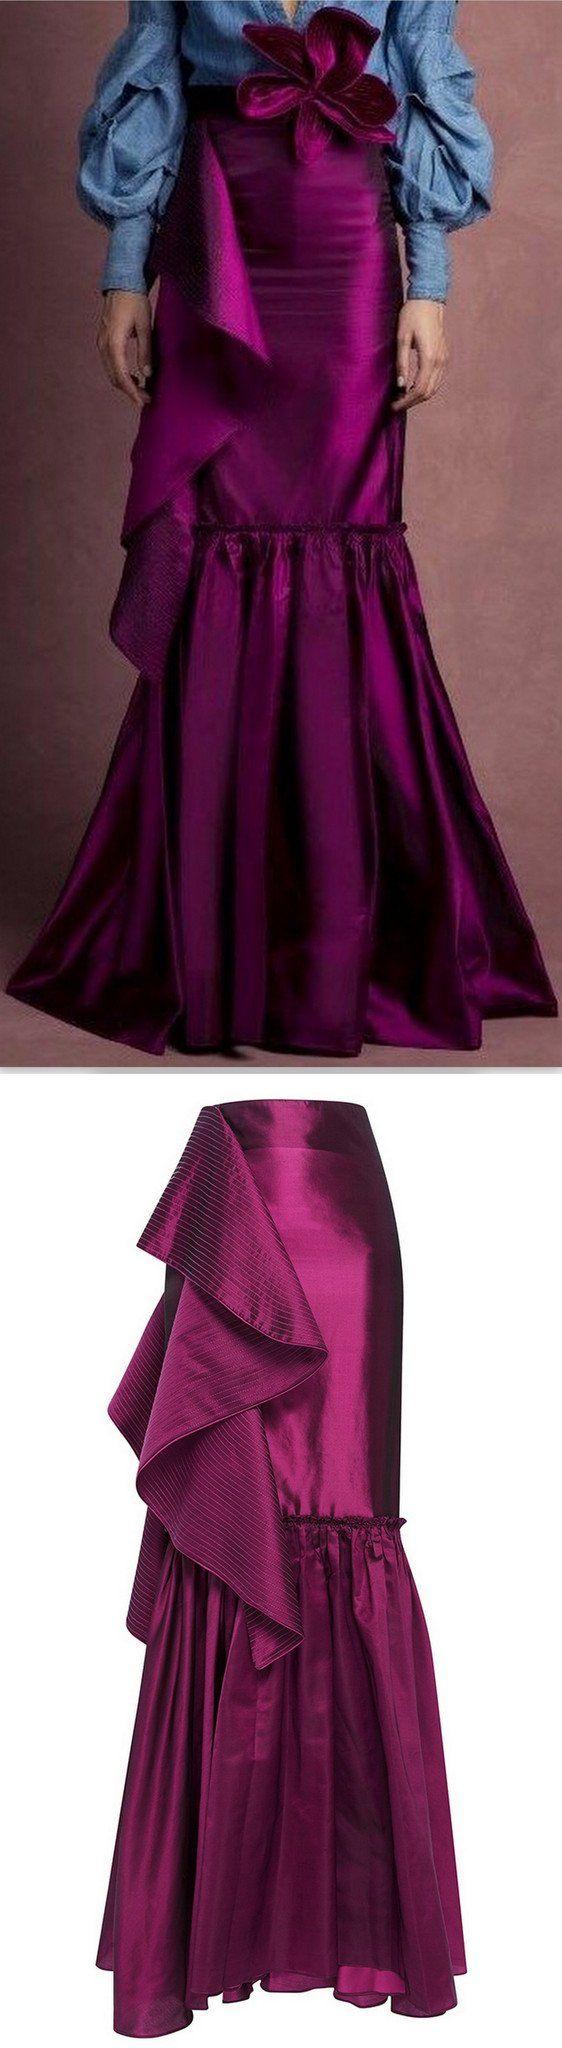 'Anna Karenina' Fluted Skirt